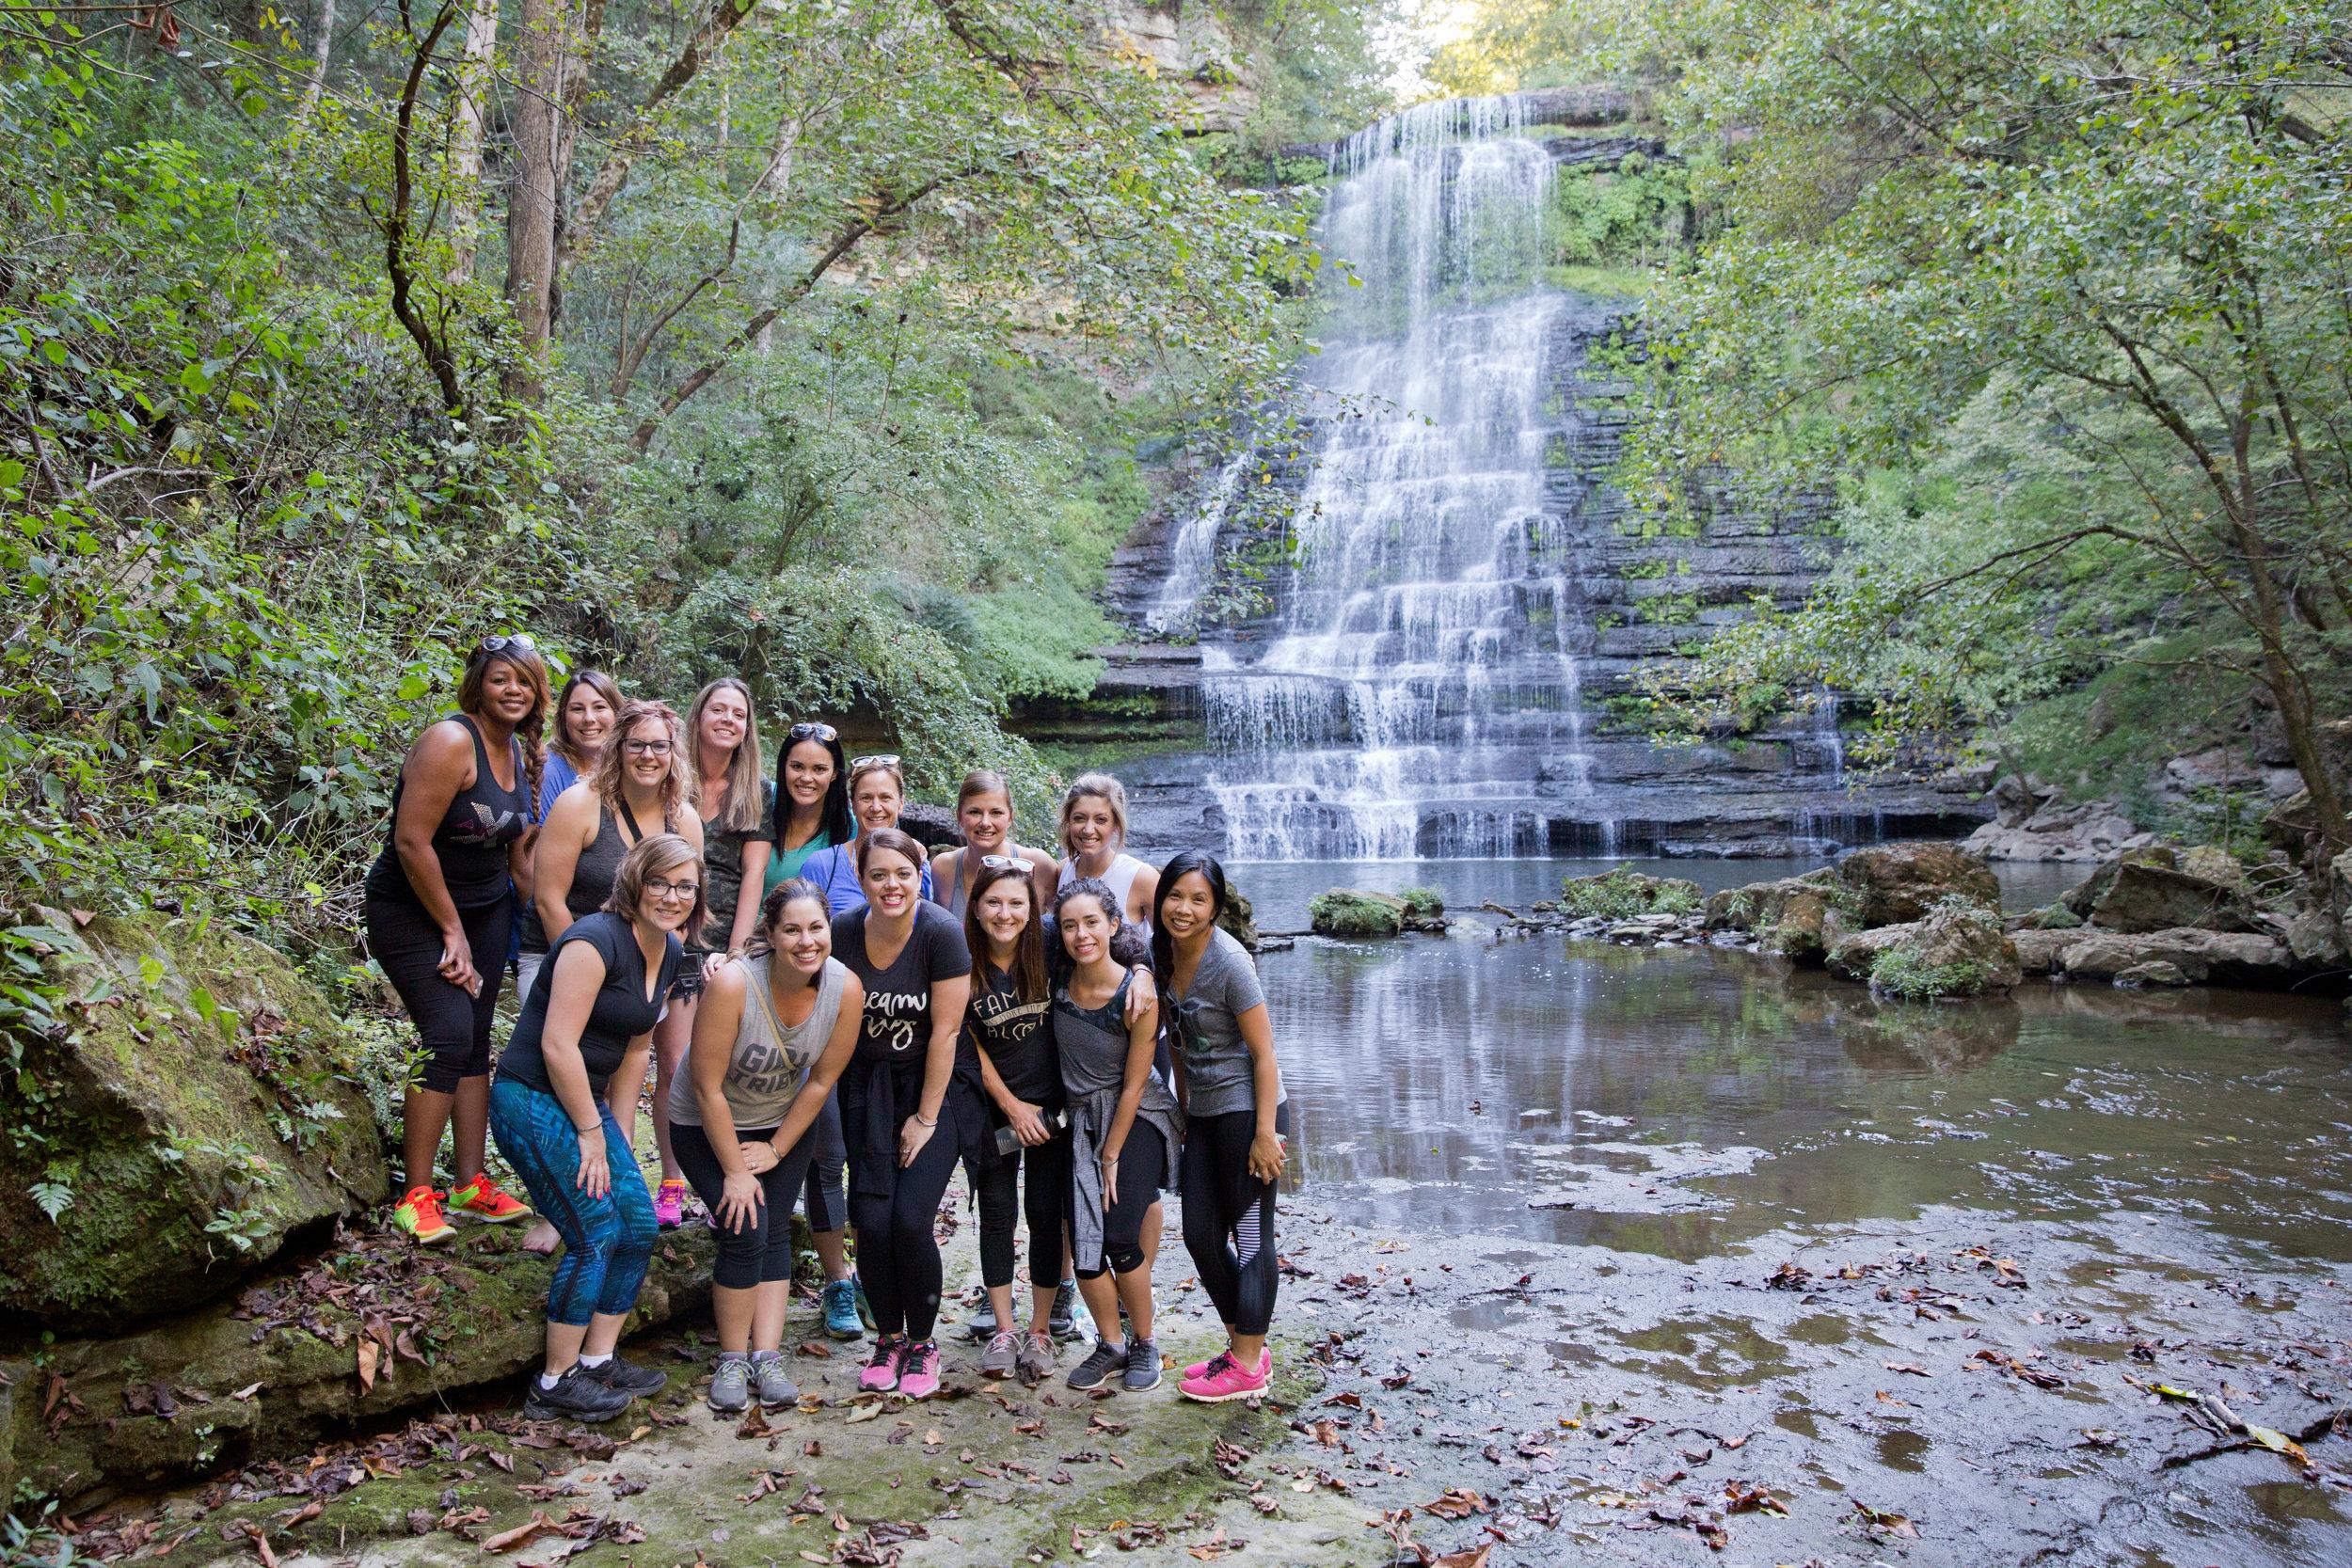 The Waterfall, amazing!